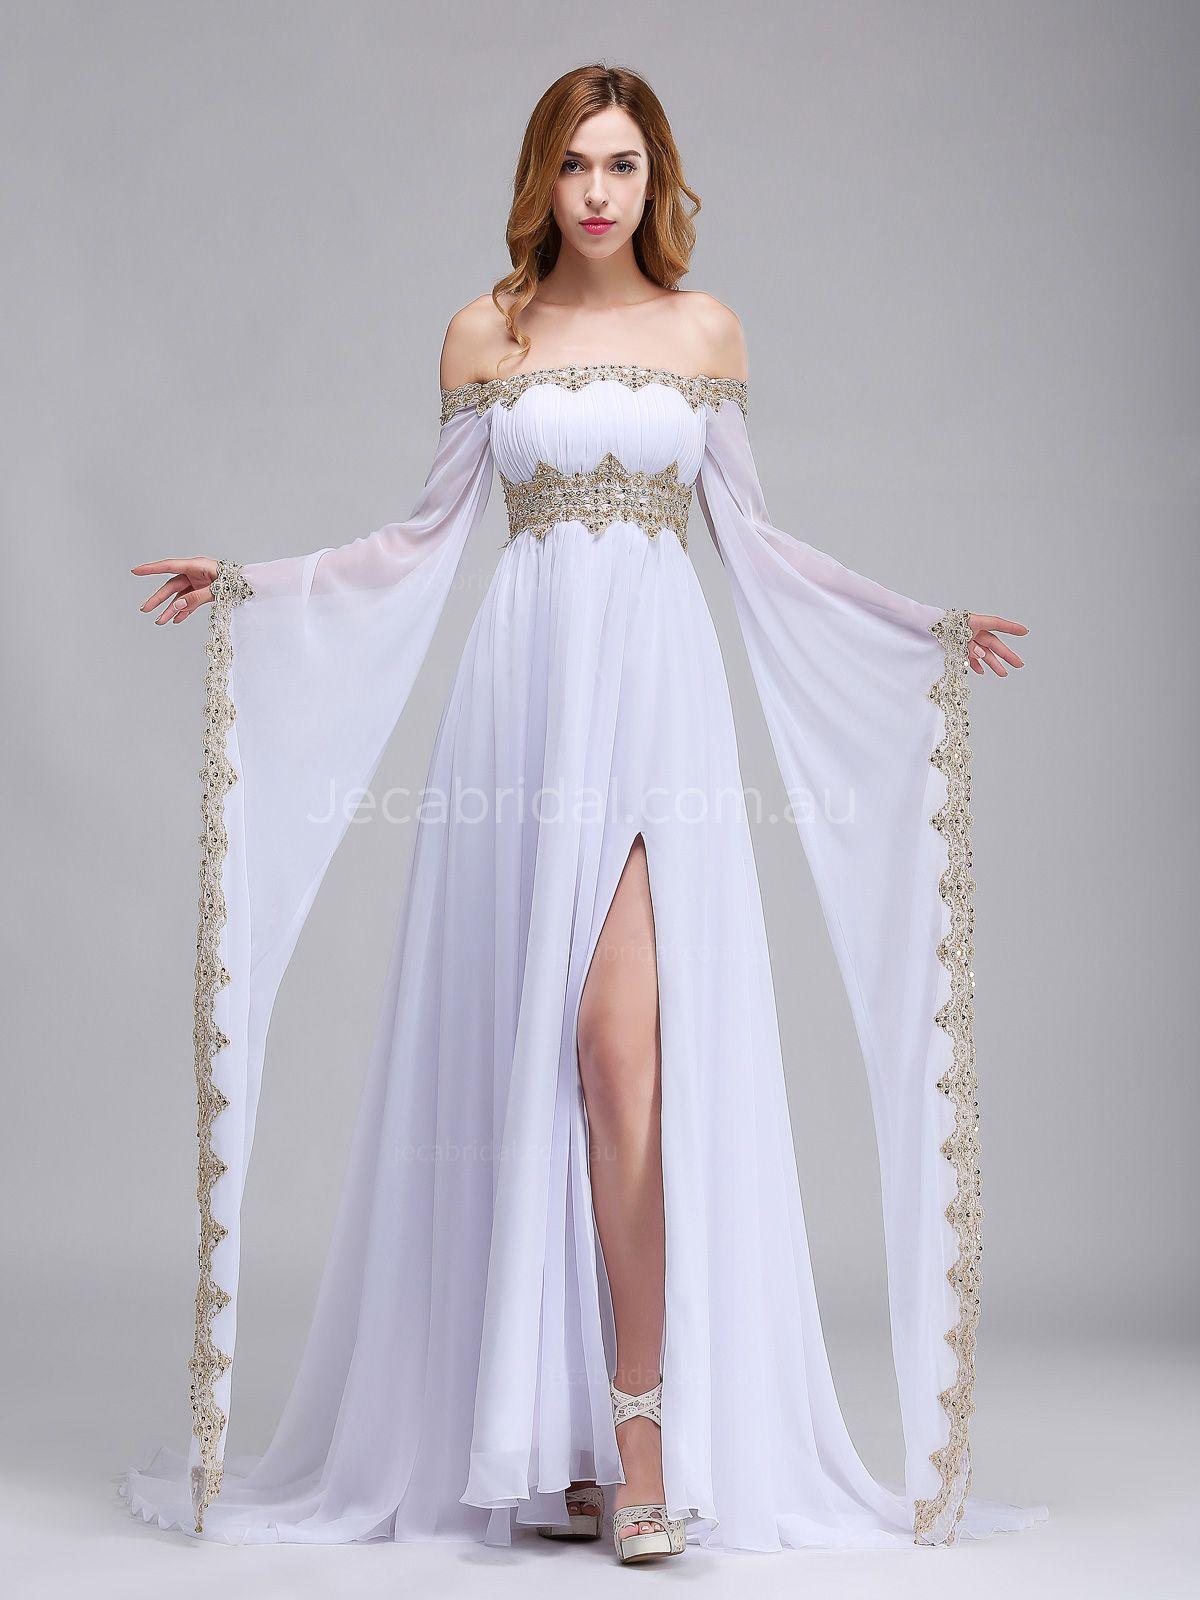 blue and white wedding dresses photo - 1